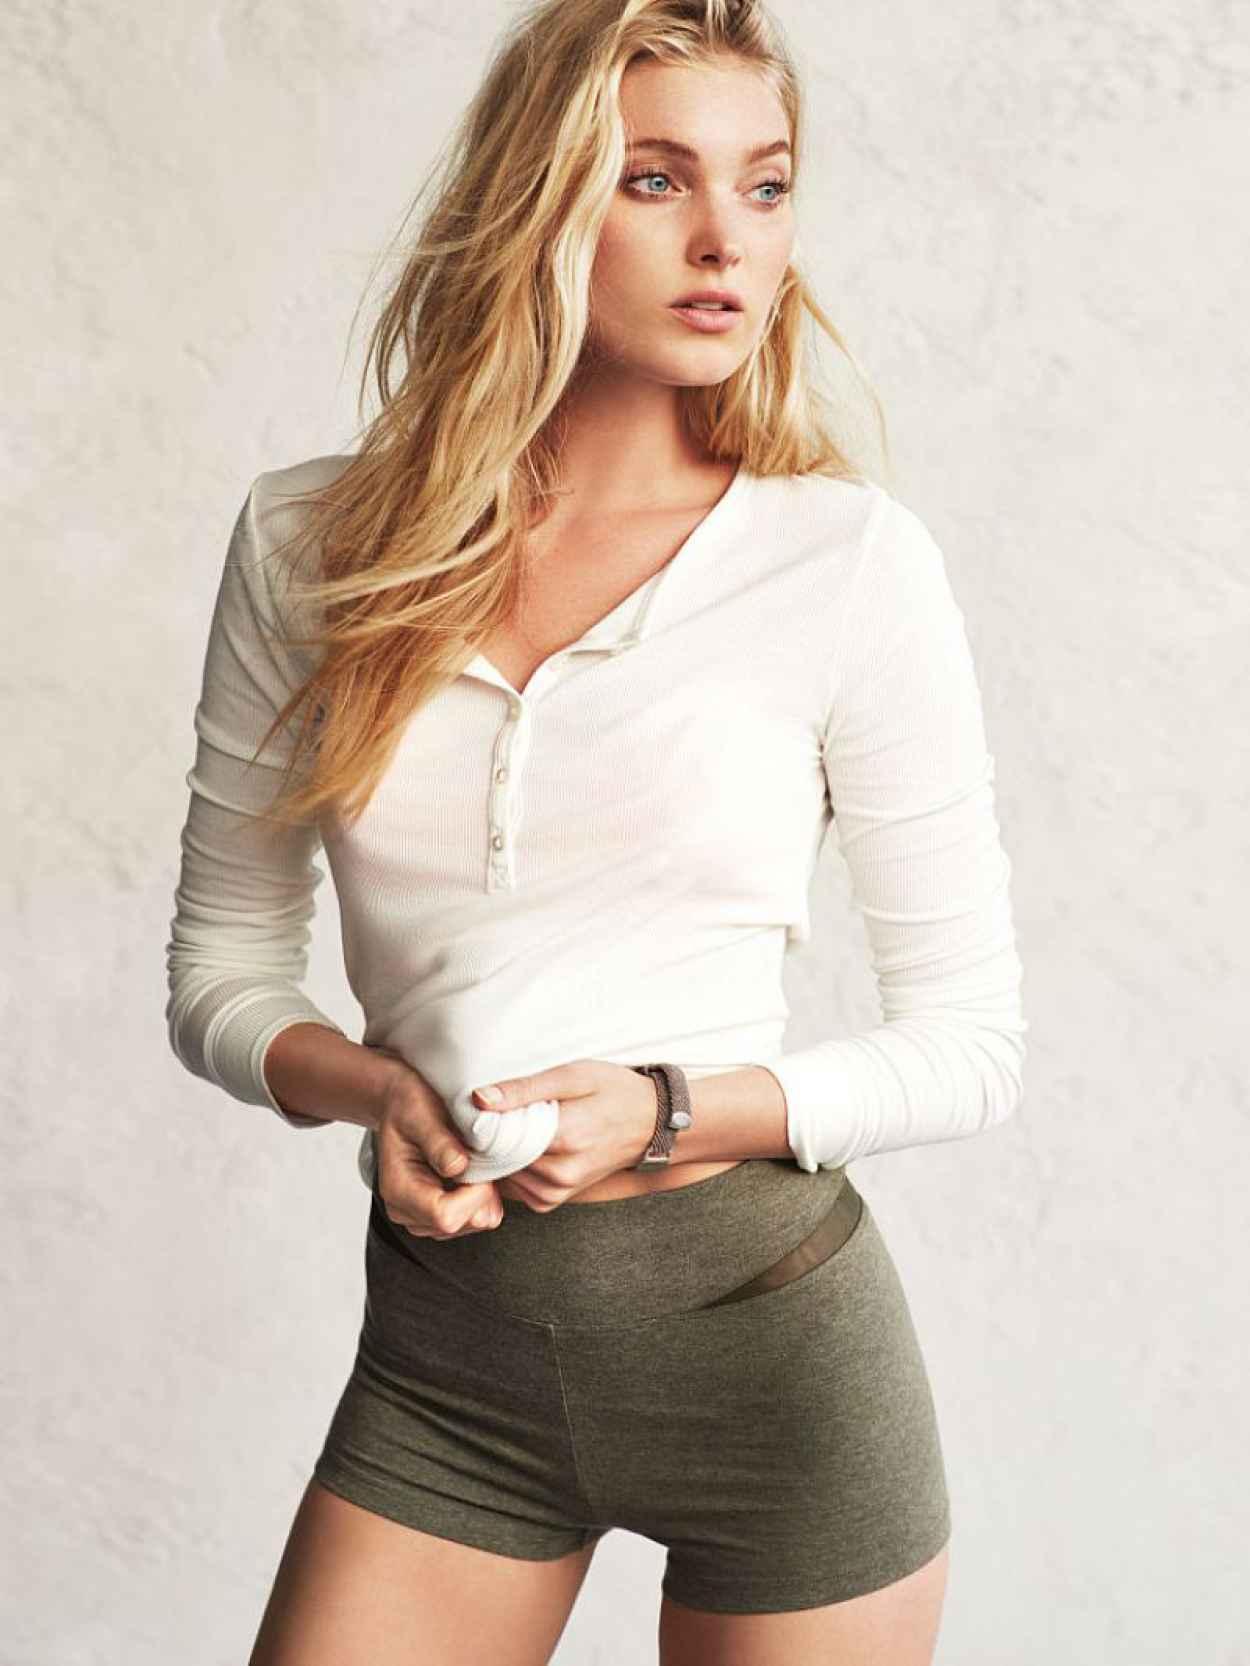 Elsa Hosk Photoshoot - Victorias Secret - December 2015-1